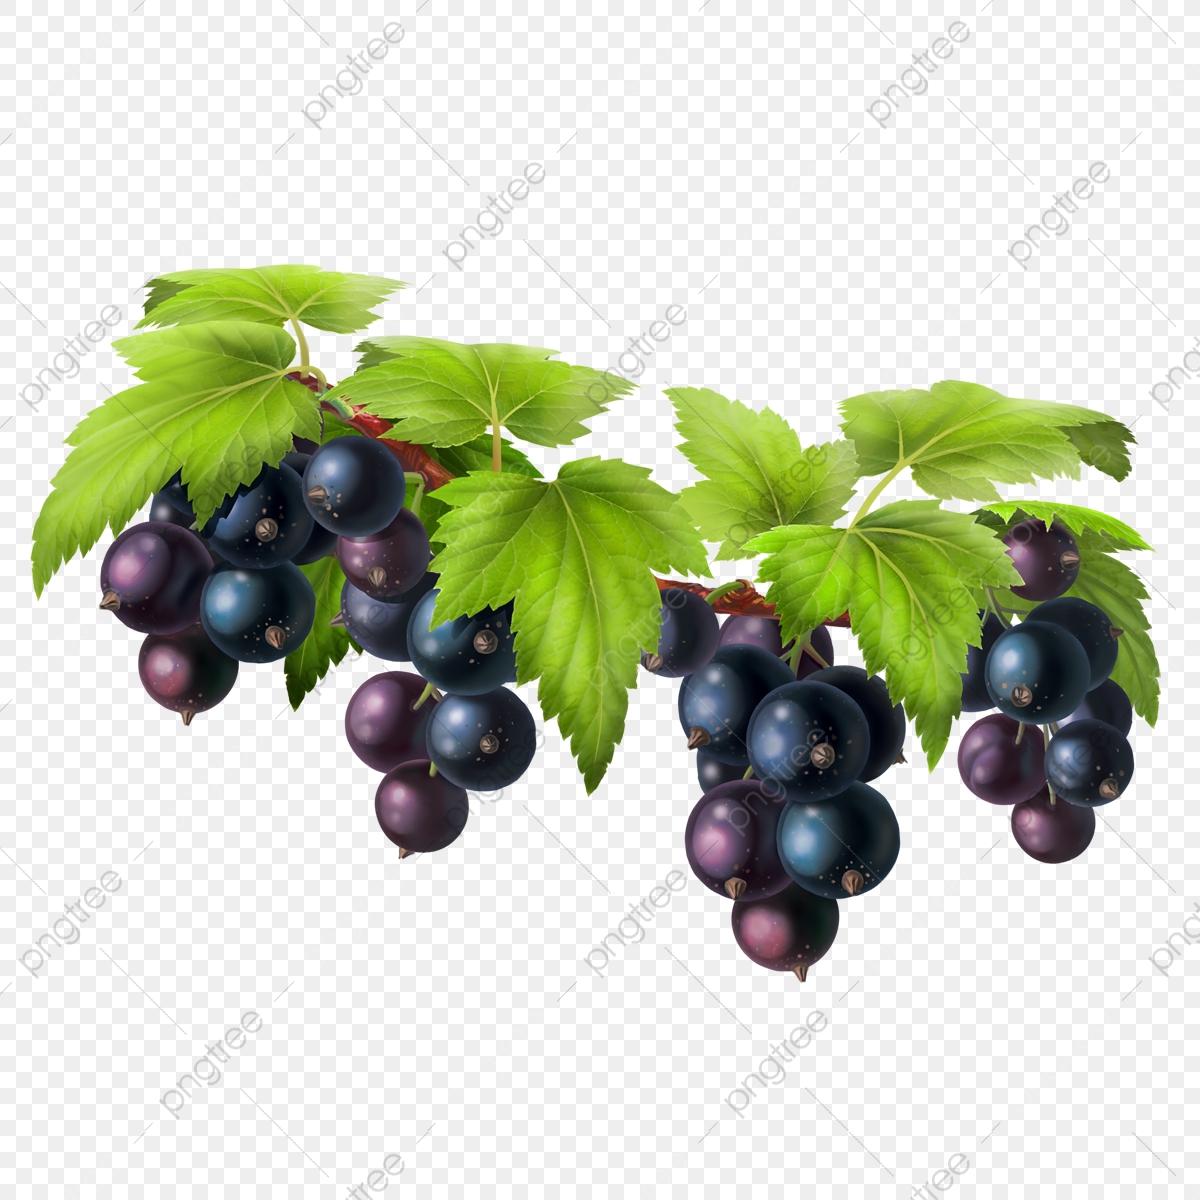 Black Currant On A Branch, Nature, Dessert, Tasty PNG Transparent.